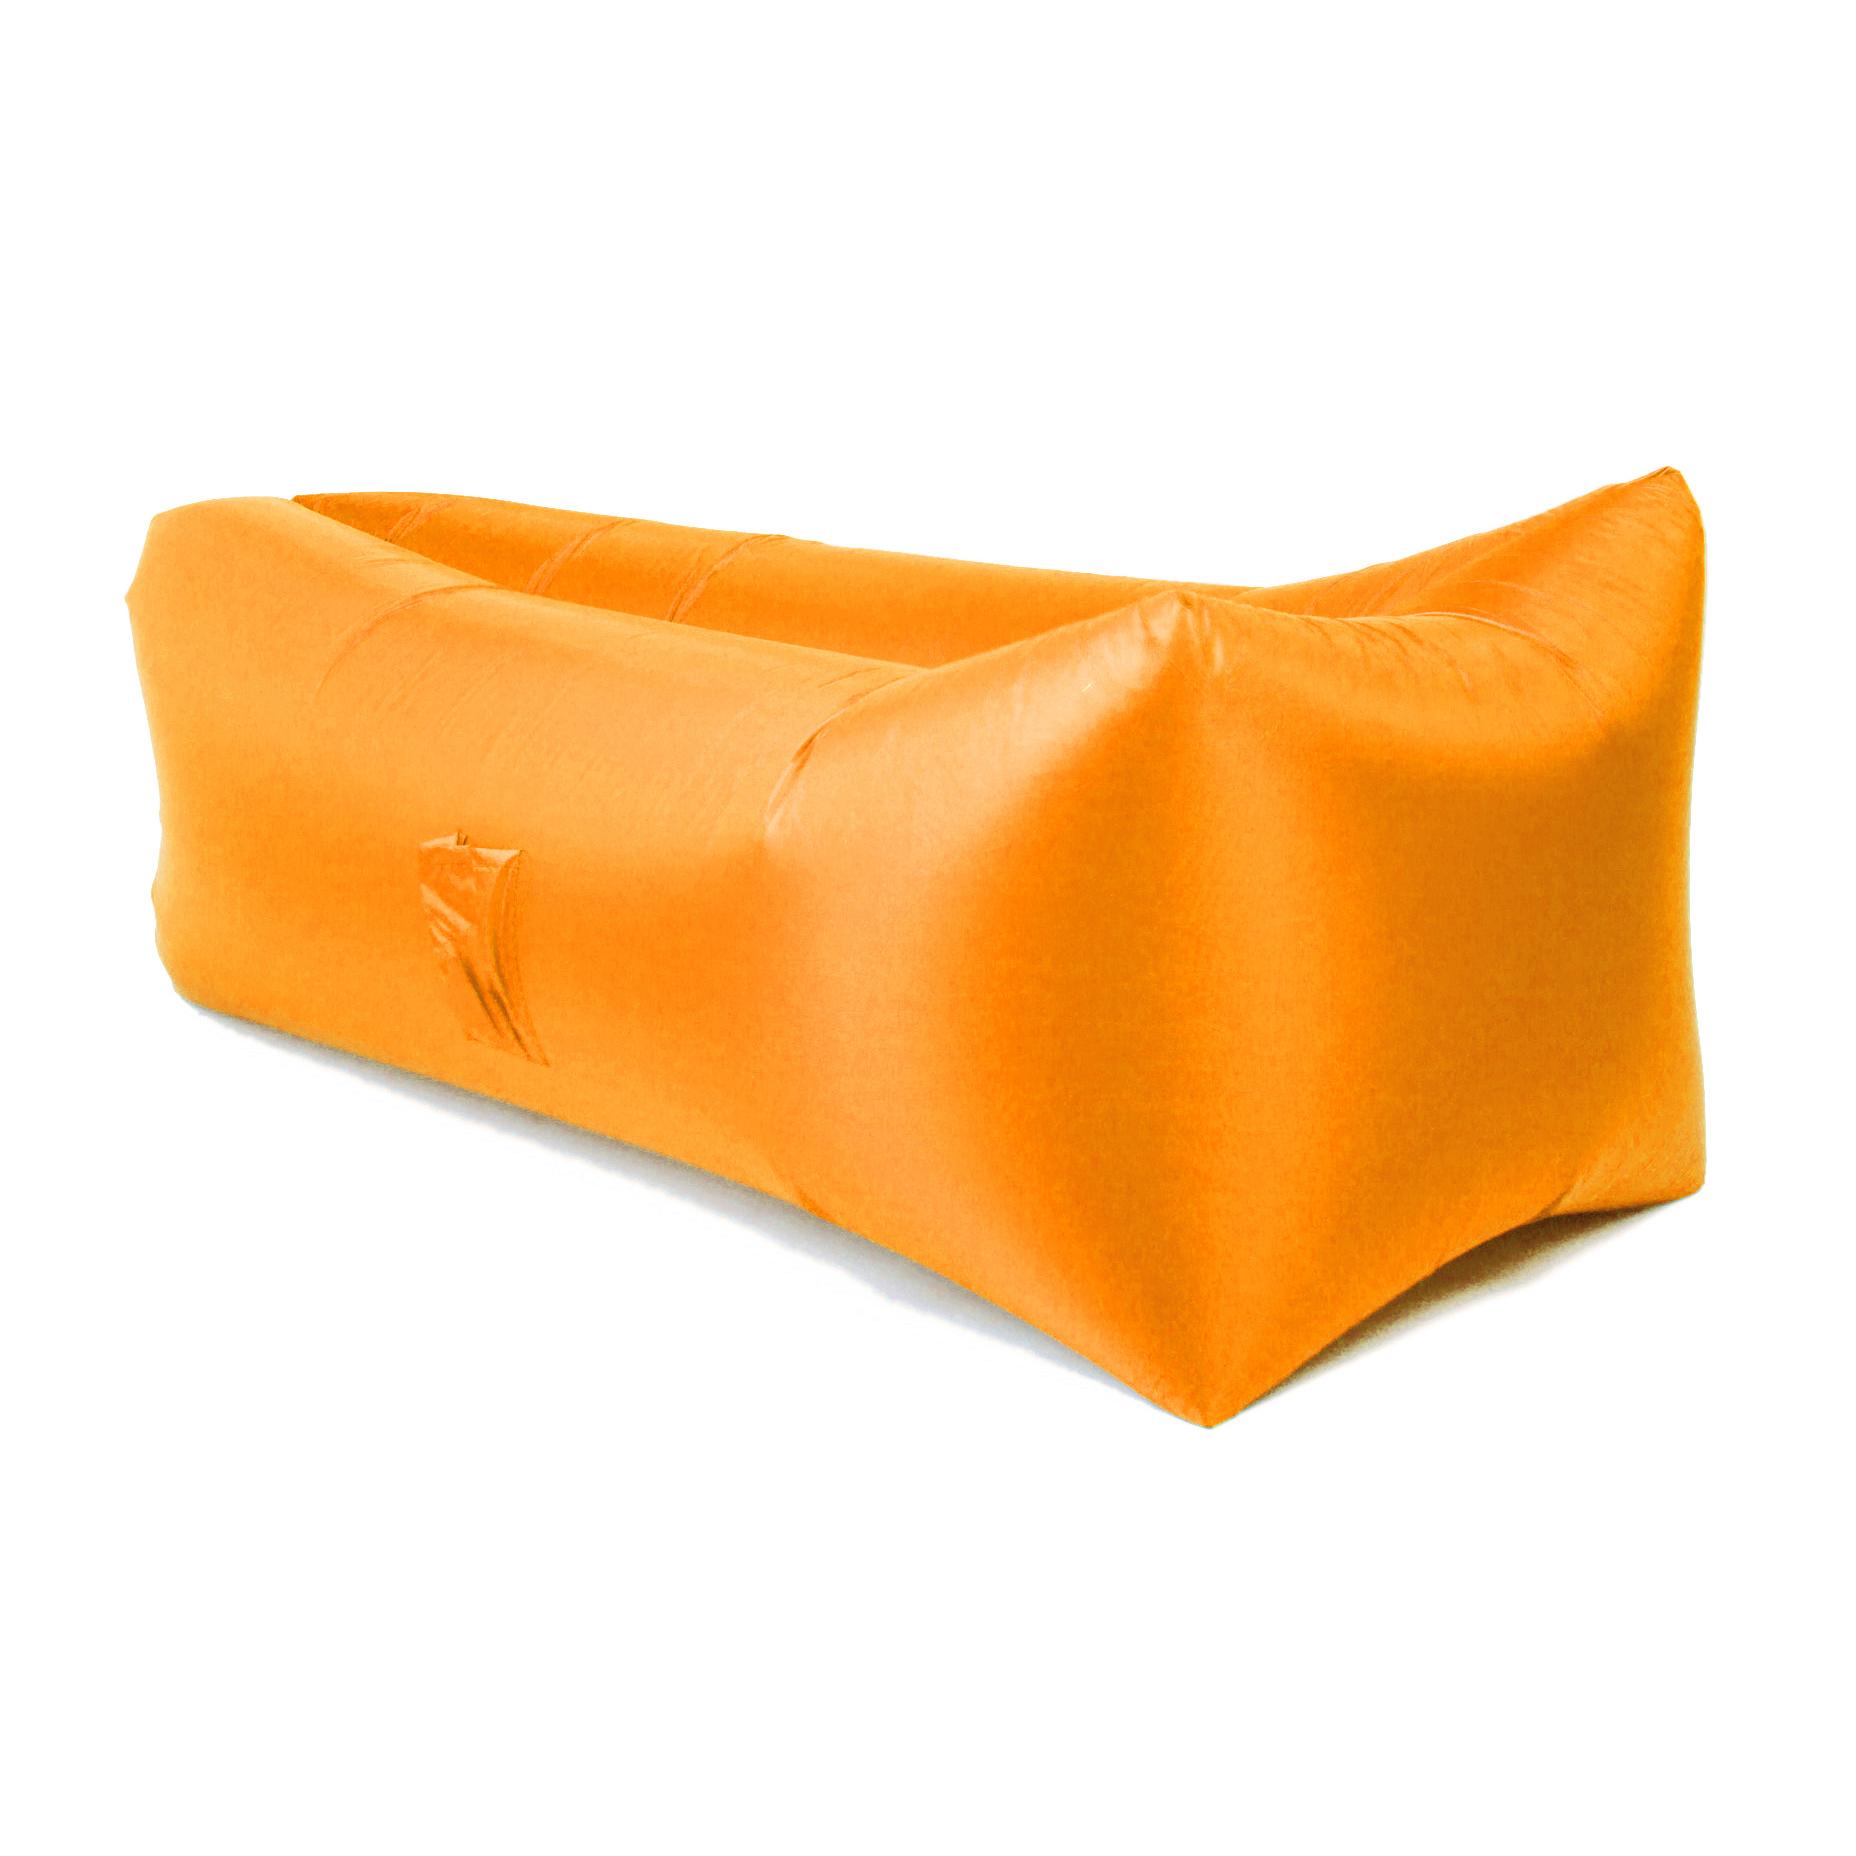 Надувной диван БИВАН 2,0 (BVN17-ORGNL-ORN) оранжевый